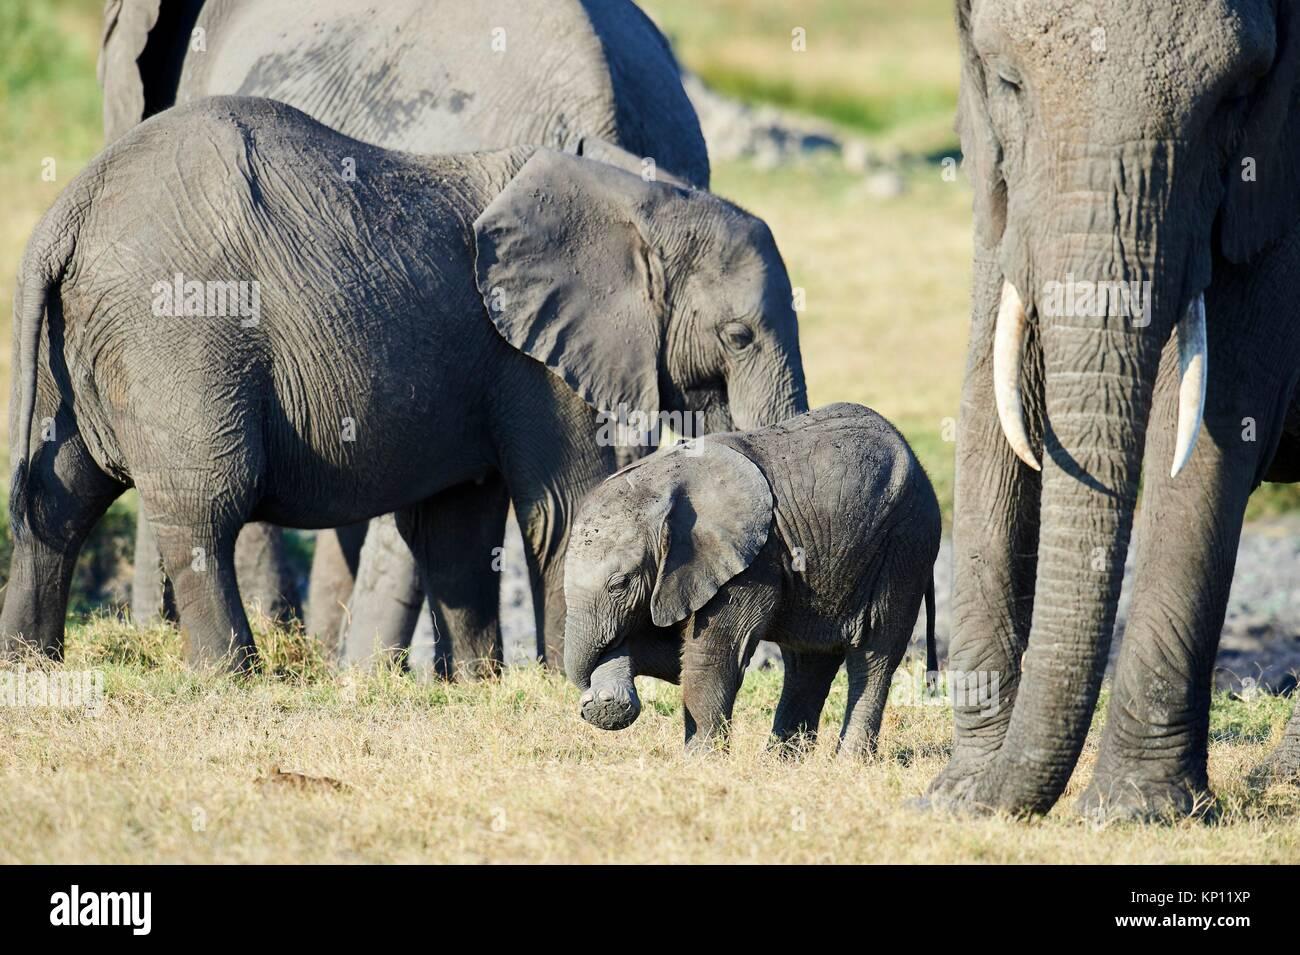 Elefante africano famiglia con la madre e i giovani vitelli (Loxodonta africana), Duba Plains, Okavango Delta, Botswana, Immagini Stock